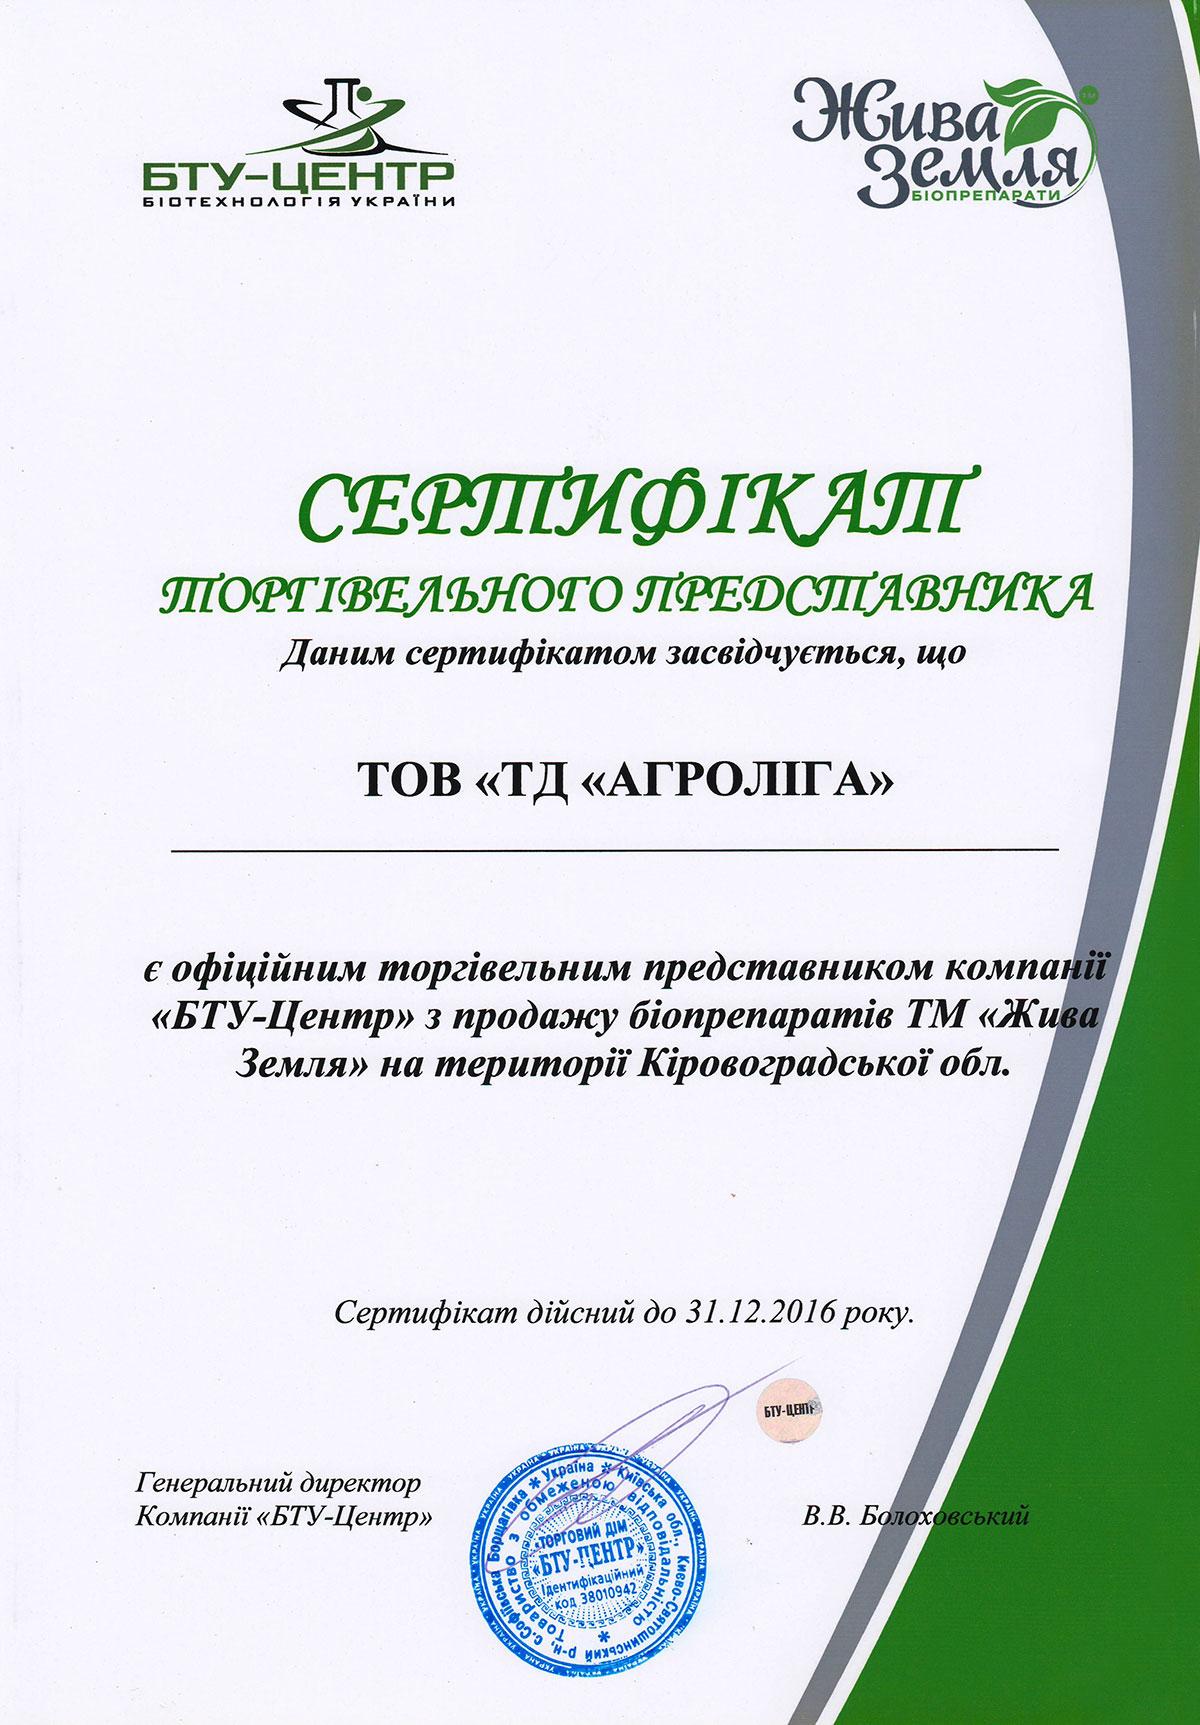 Дистрибьютор БТУ-Центр